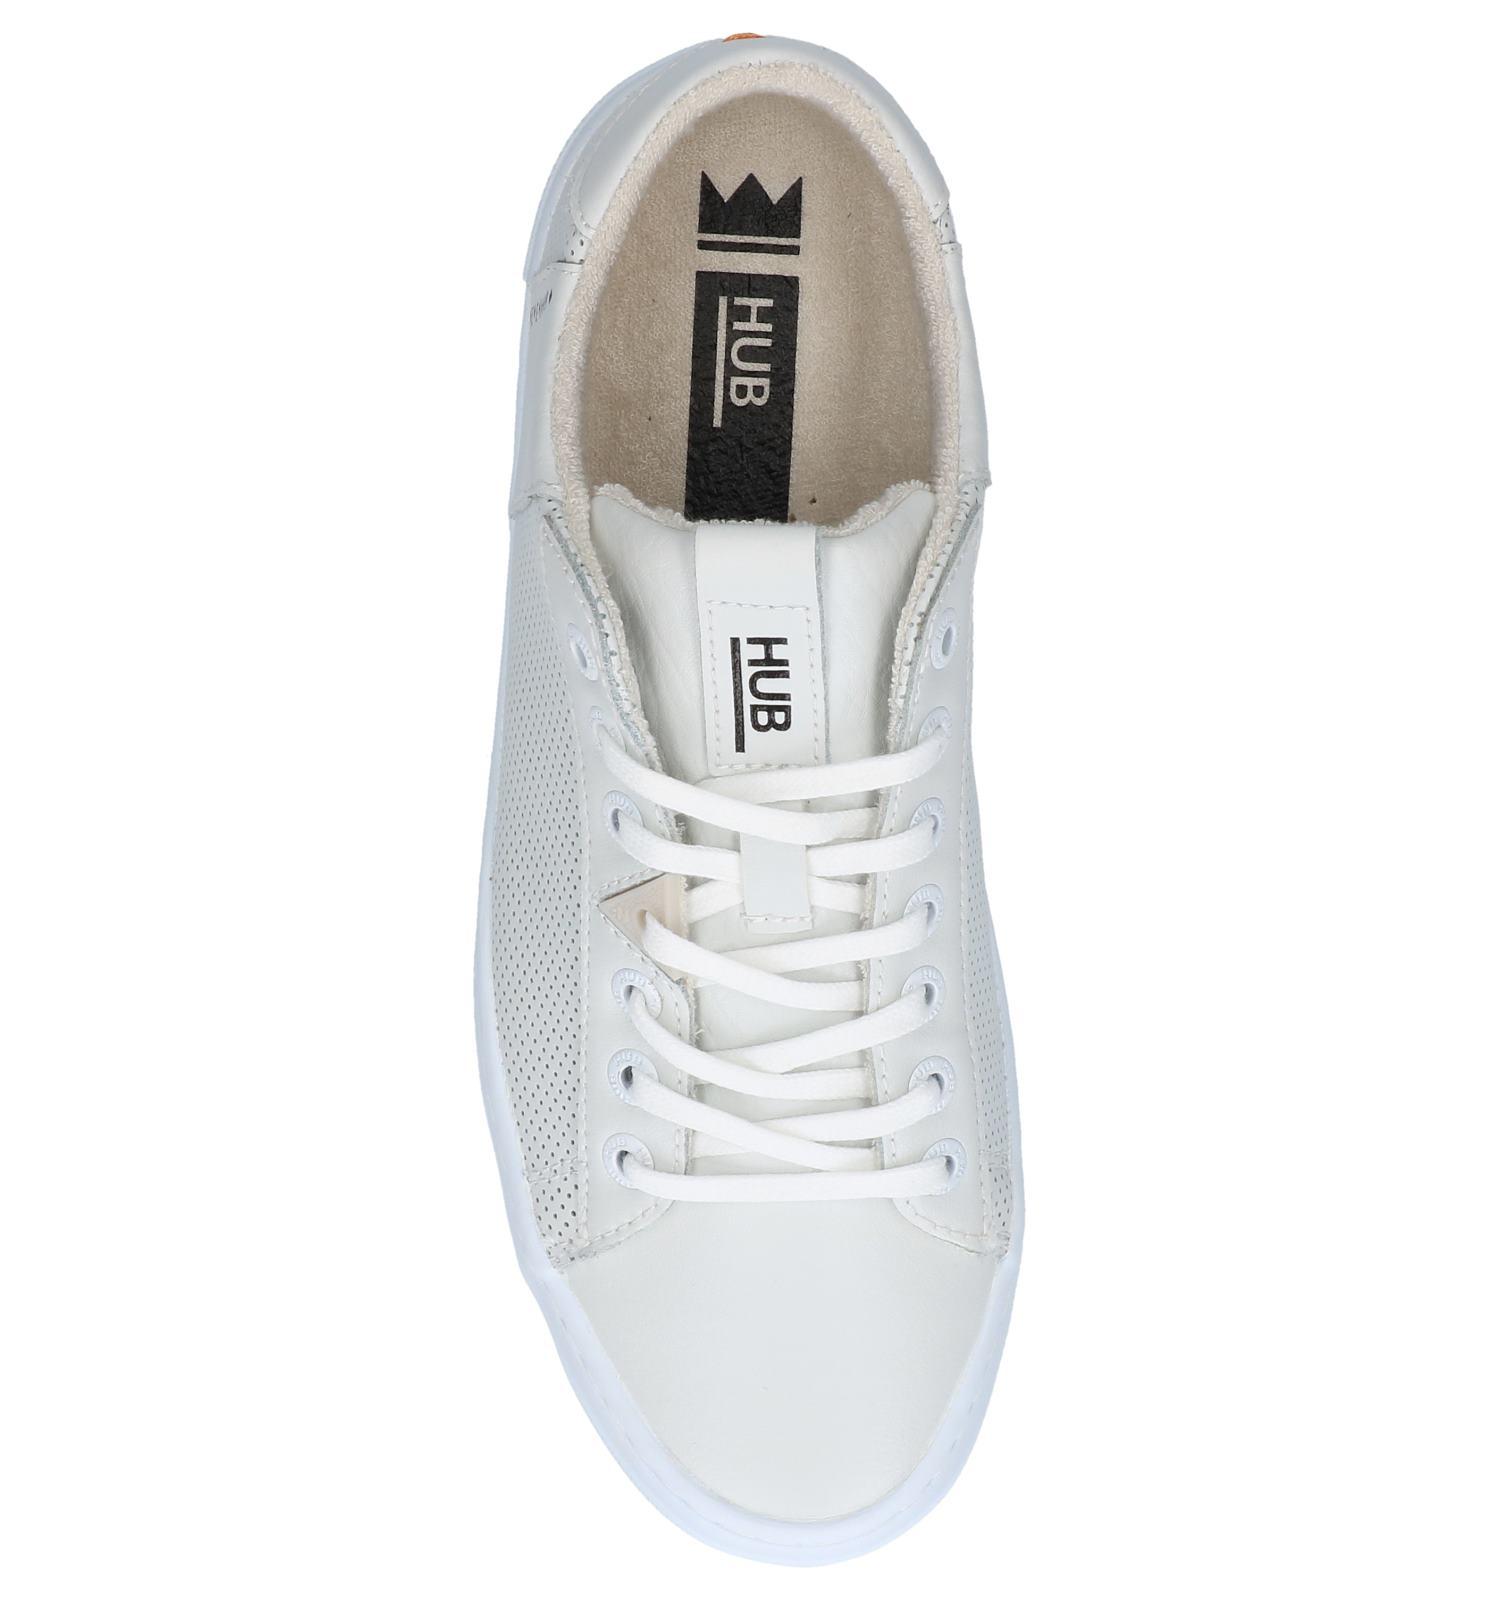 Witte Geklede Sneakers Hub Hook | SCHOENENTORFS.NL | Gratis